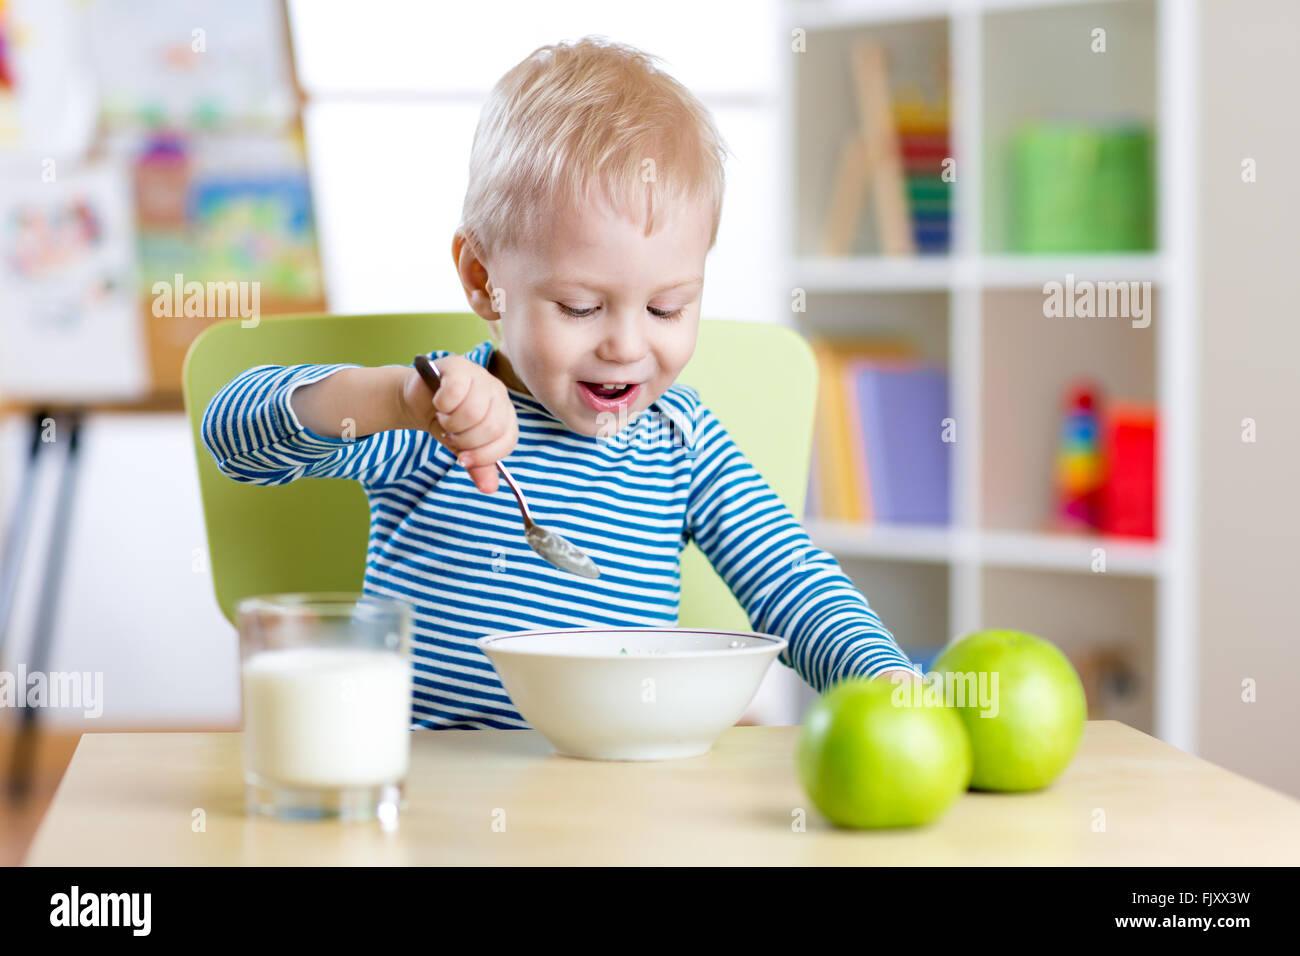 Kind gesunder Ernährung zu Hause oder im kindergarten Stockbild